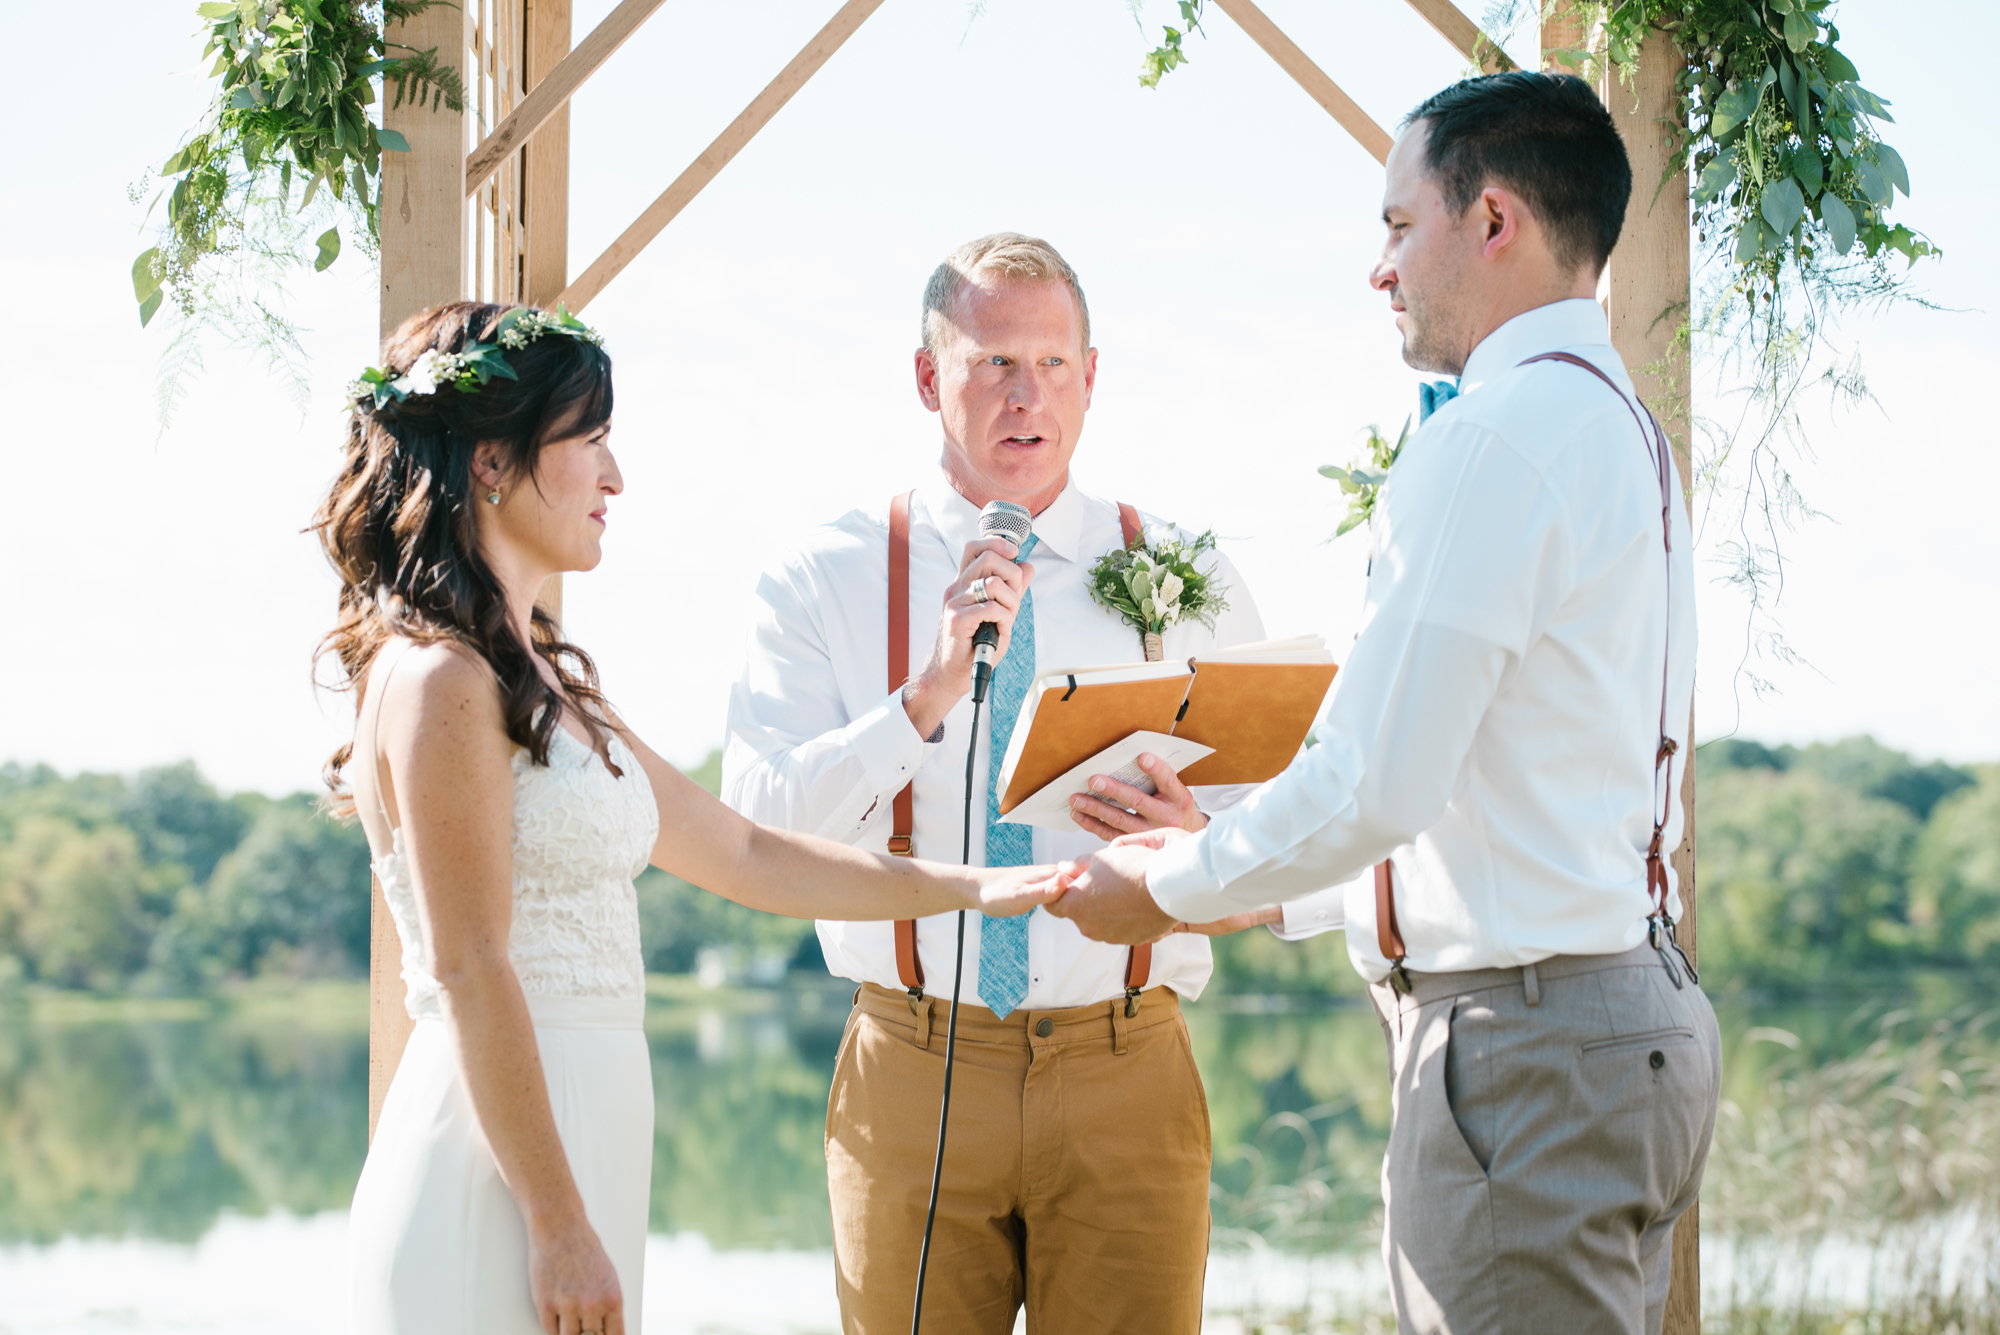 Quincy-Coldwater-Michigan-farm-wedding-photogapher-sydney-marie (180).jpg